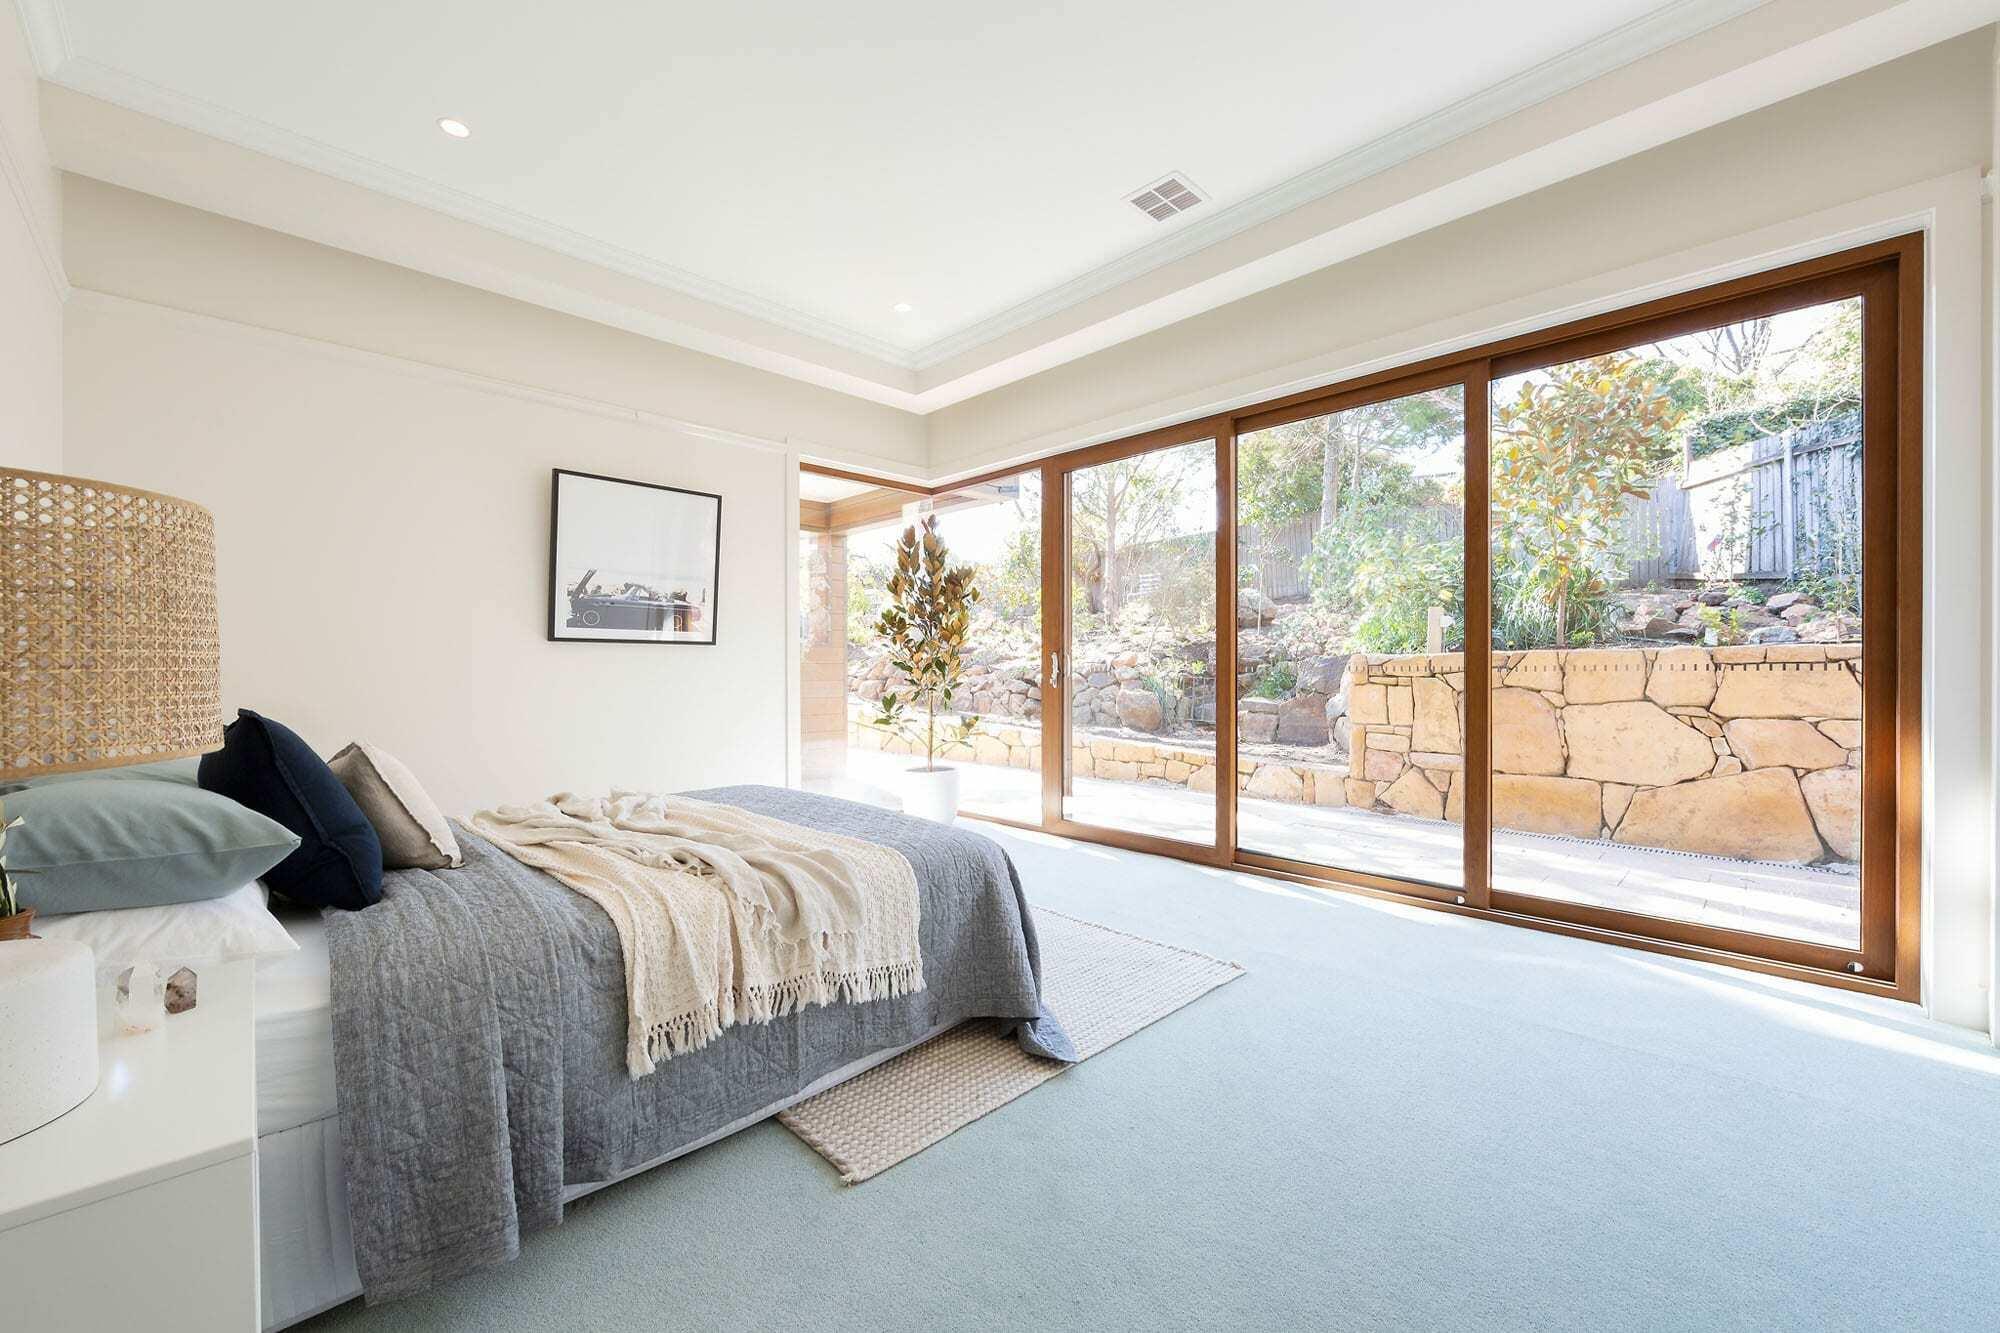 Homes by Howe Canberra builder – Governor Generals' renovation extension – Master bedroom extension